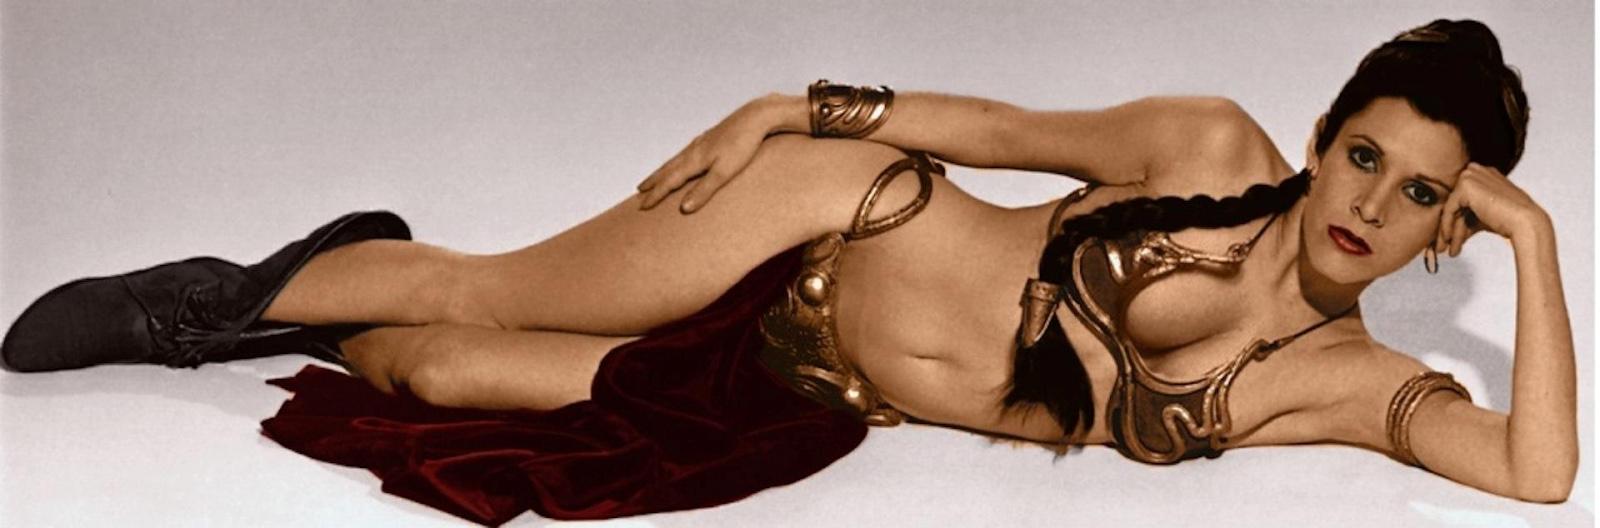 「star wars leia」の画像検索結果